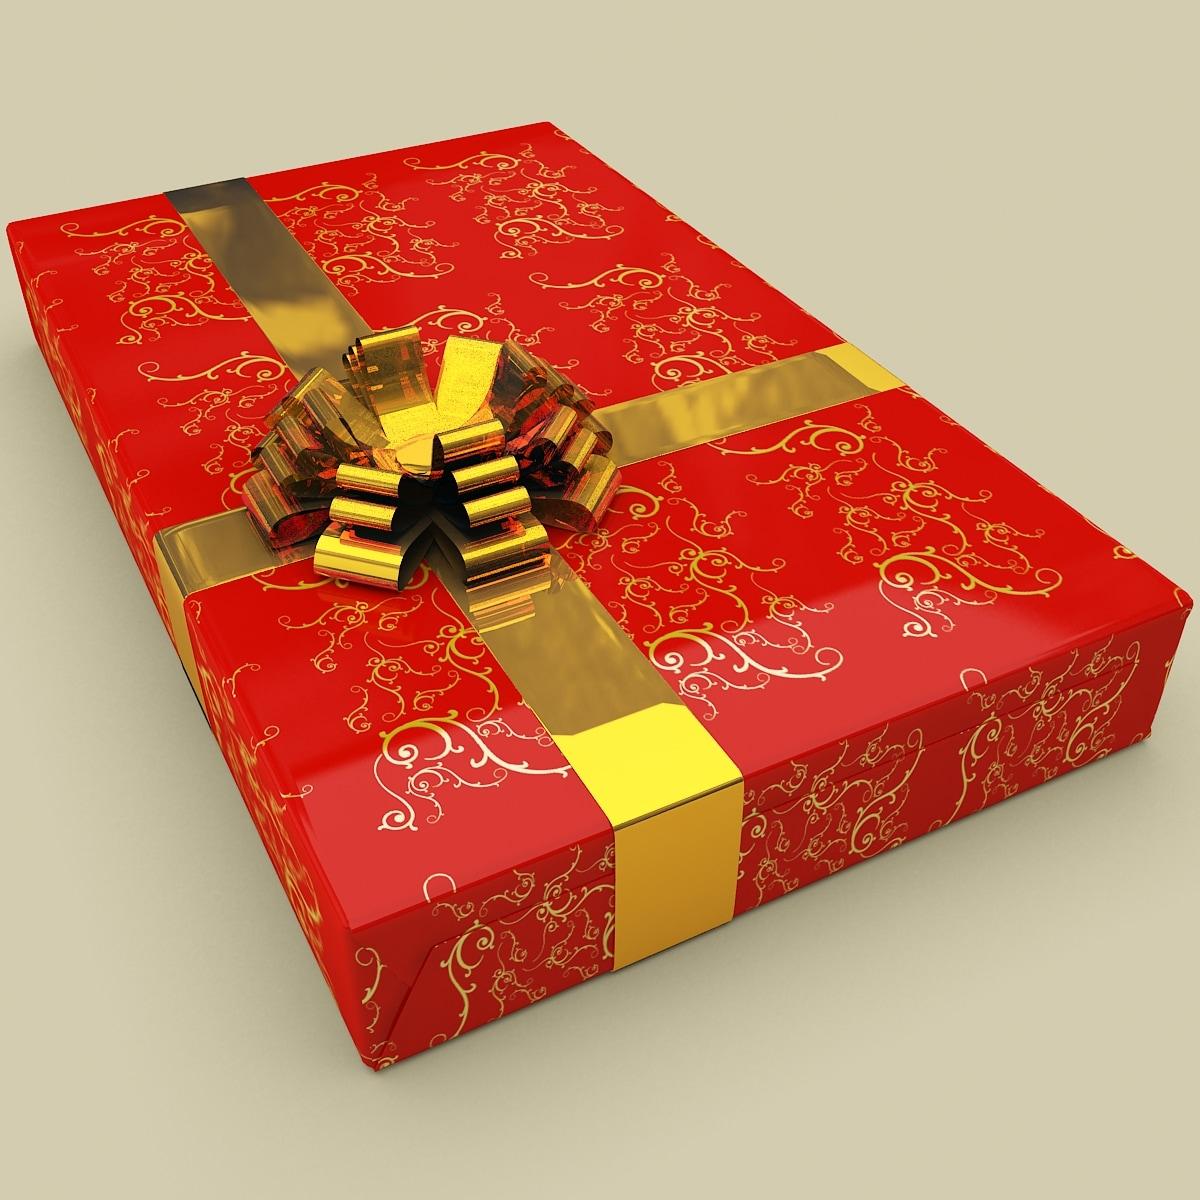 Gift_Box_V5_001.jpg